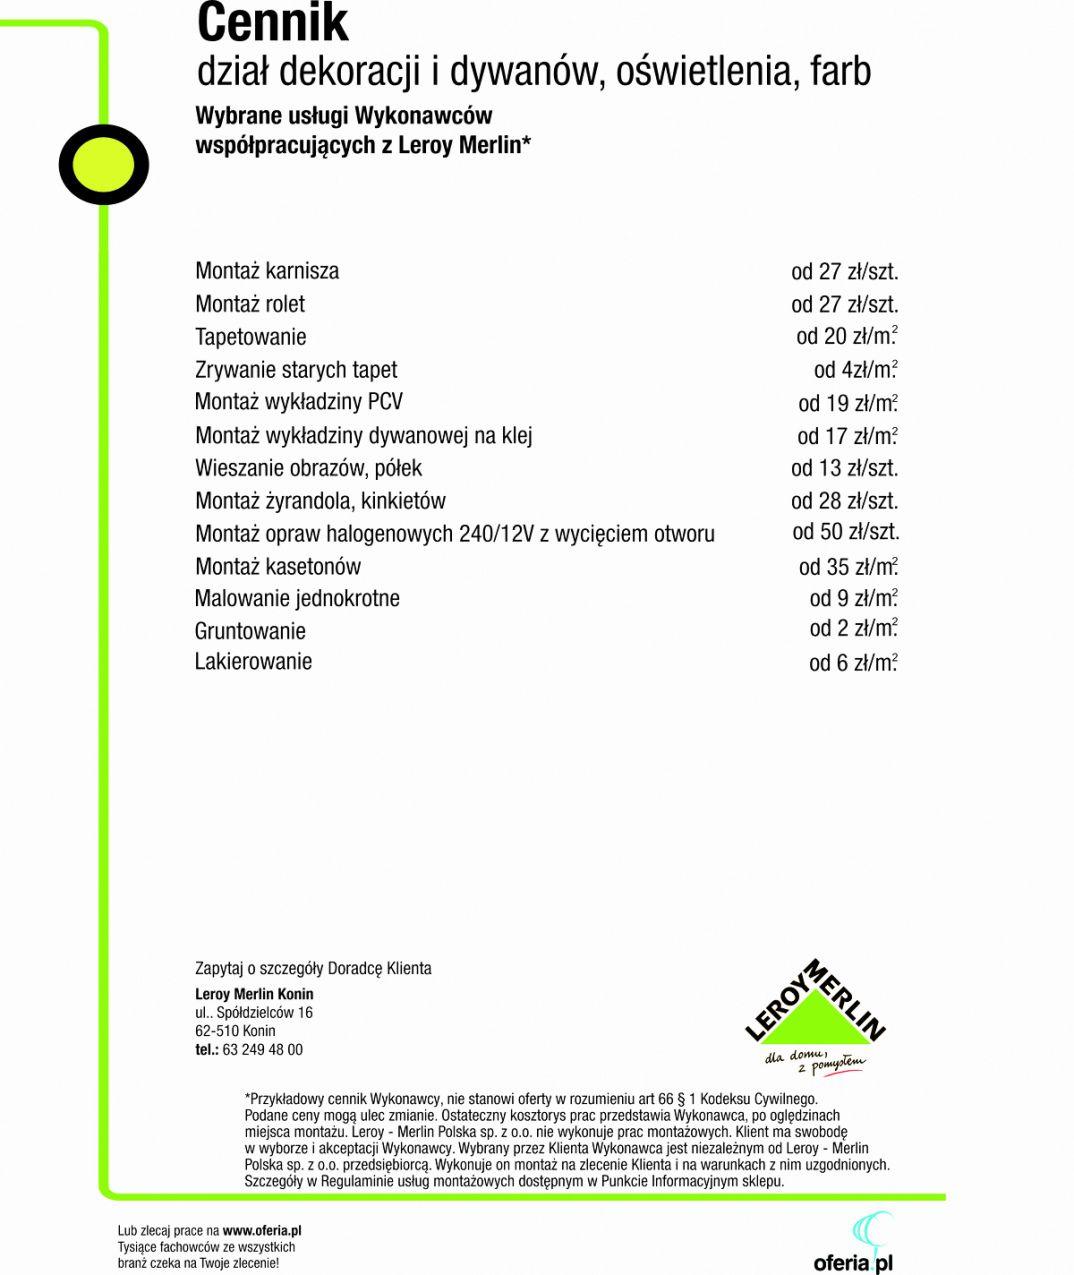 Mobilier De Jardin Leroy Merlin Frais 201 Devis Materiaux Leroy Merlin 2019